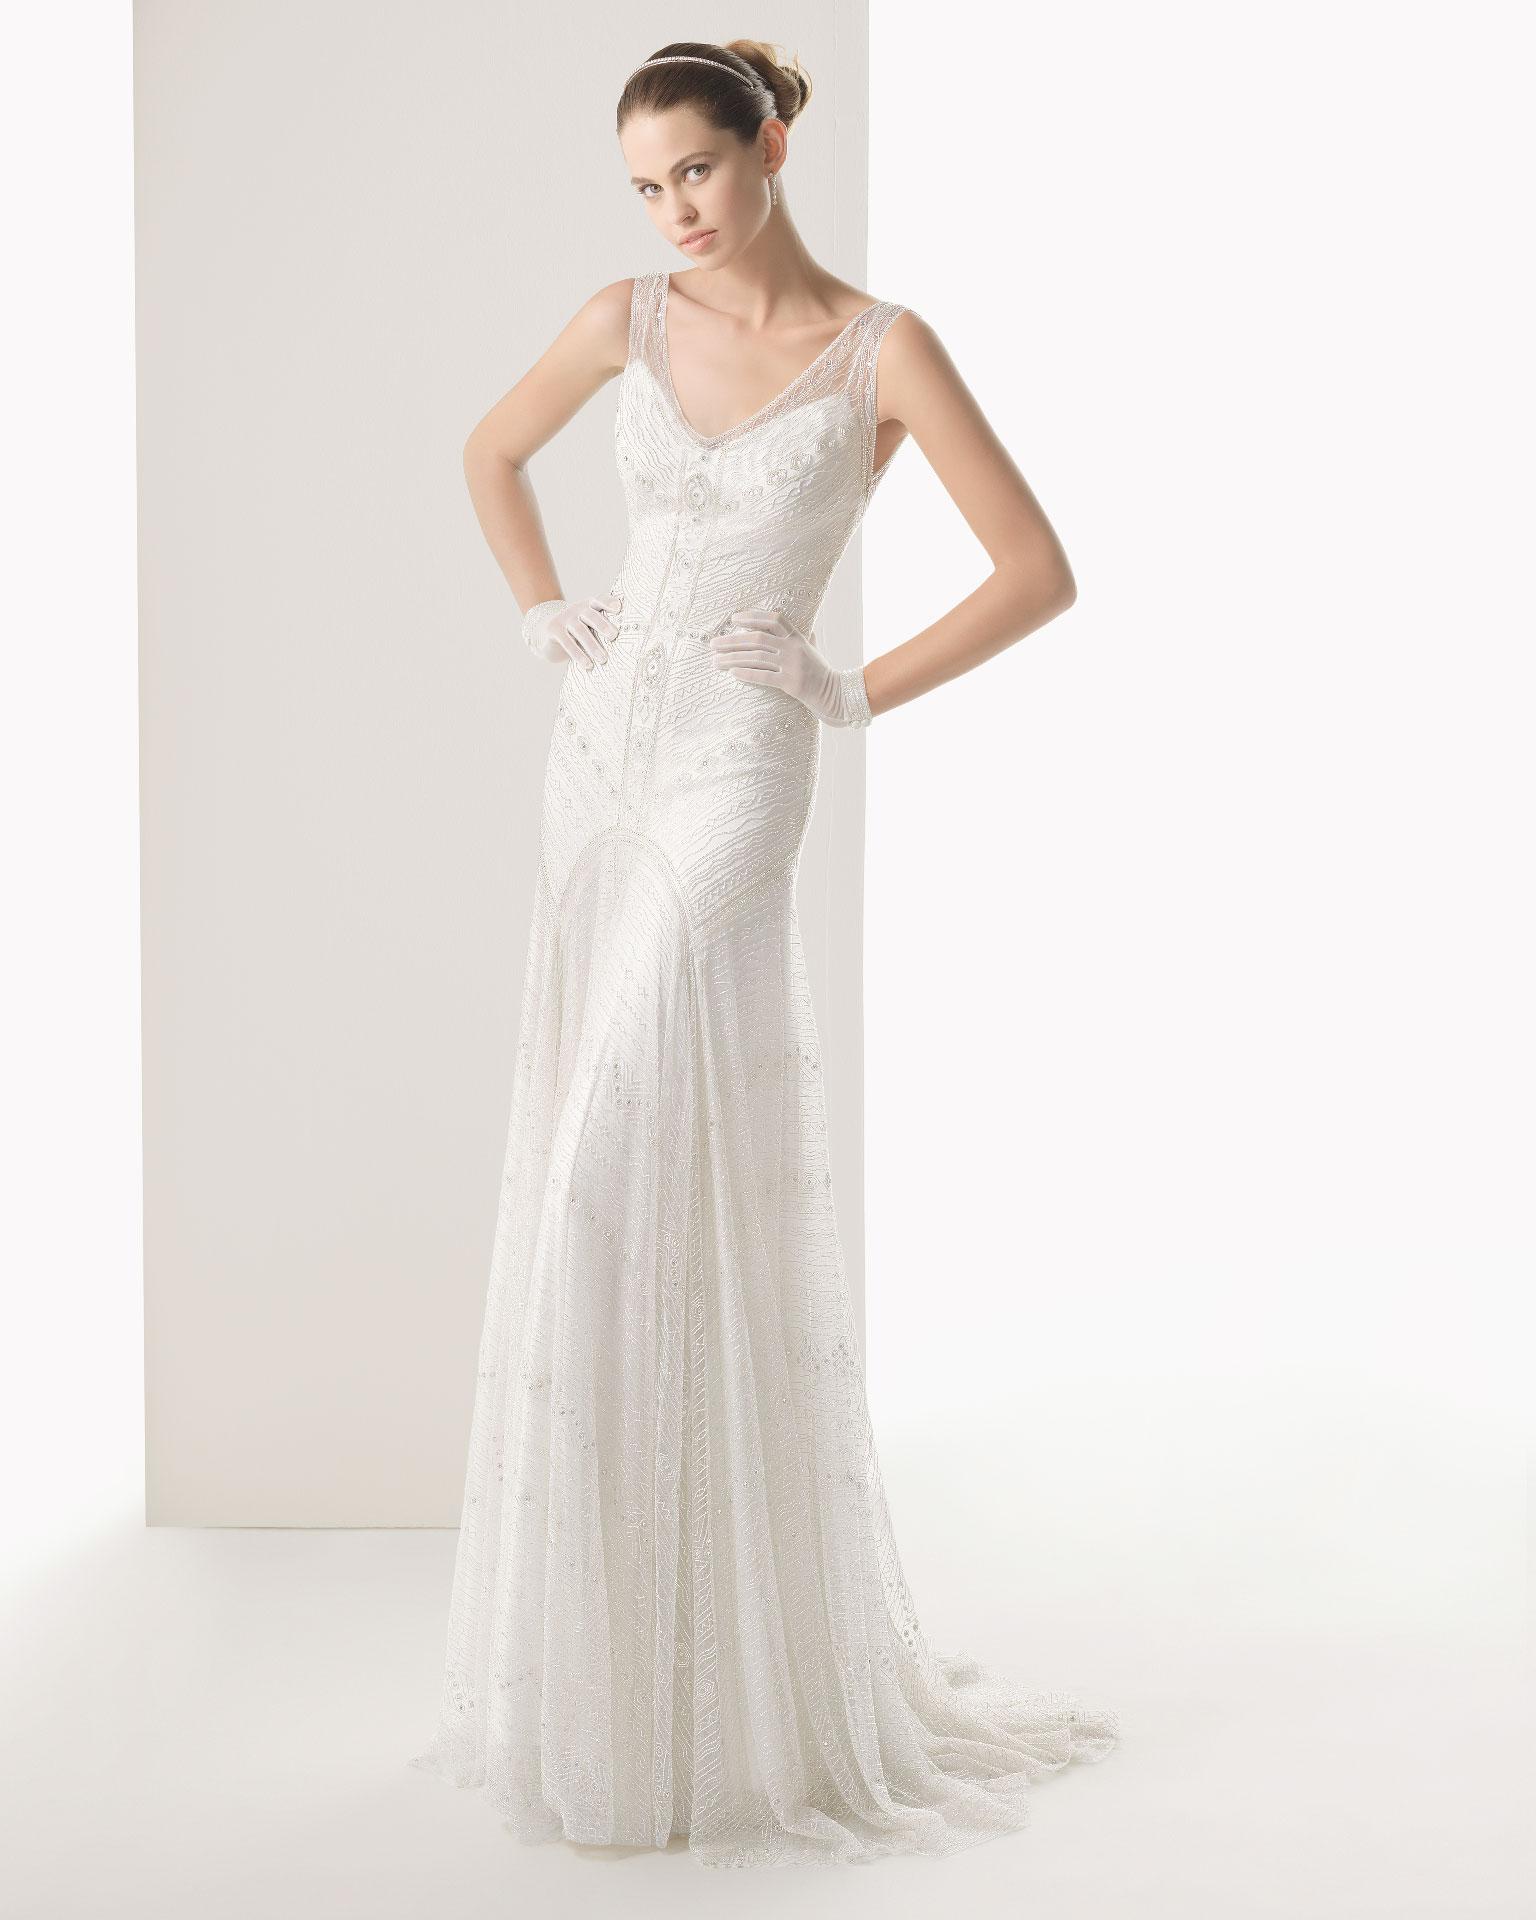 Rosa clara wedding dress 2014 bridal copla for Wedding dress rosa clara